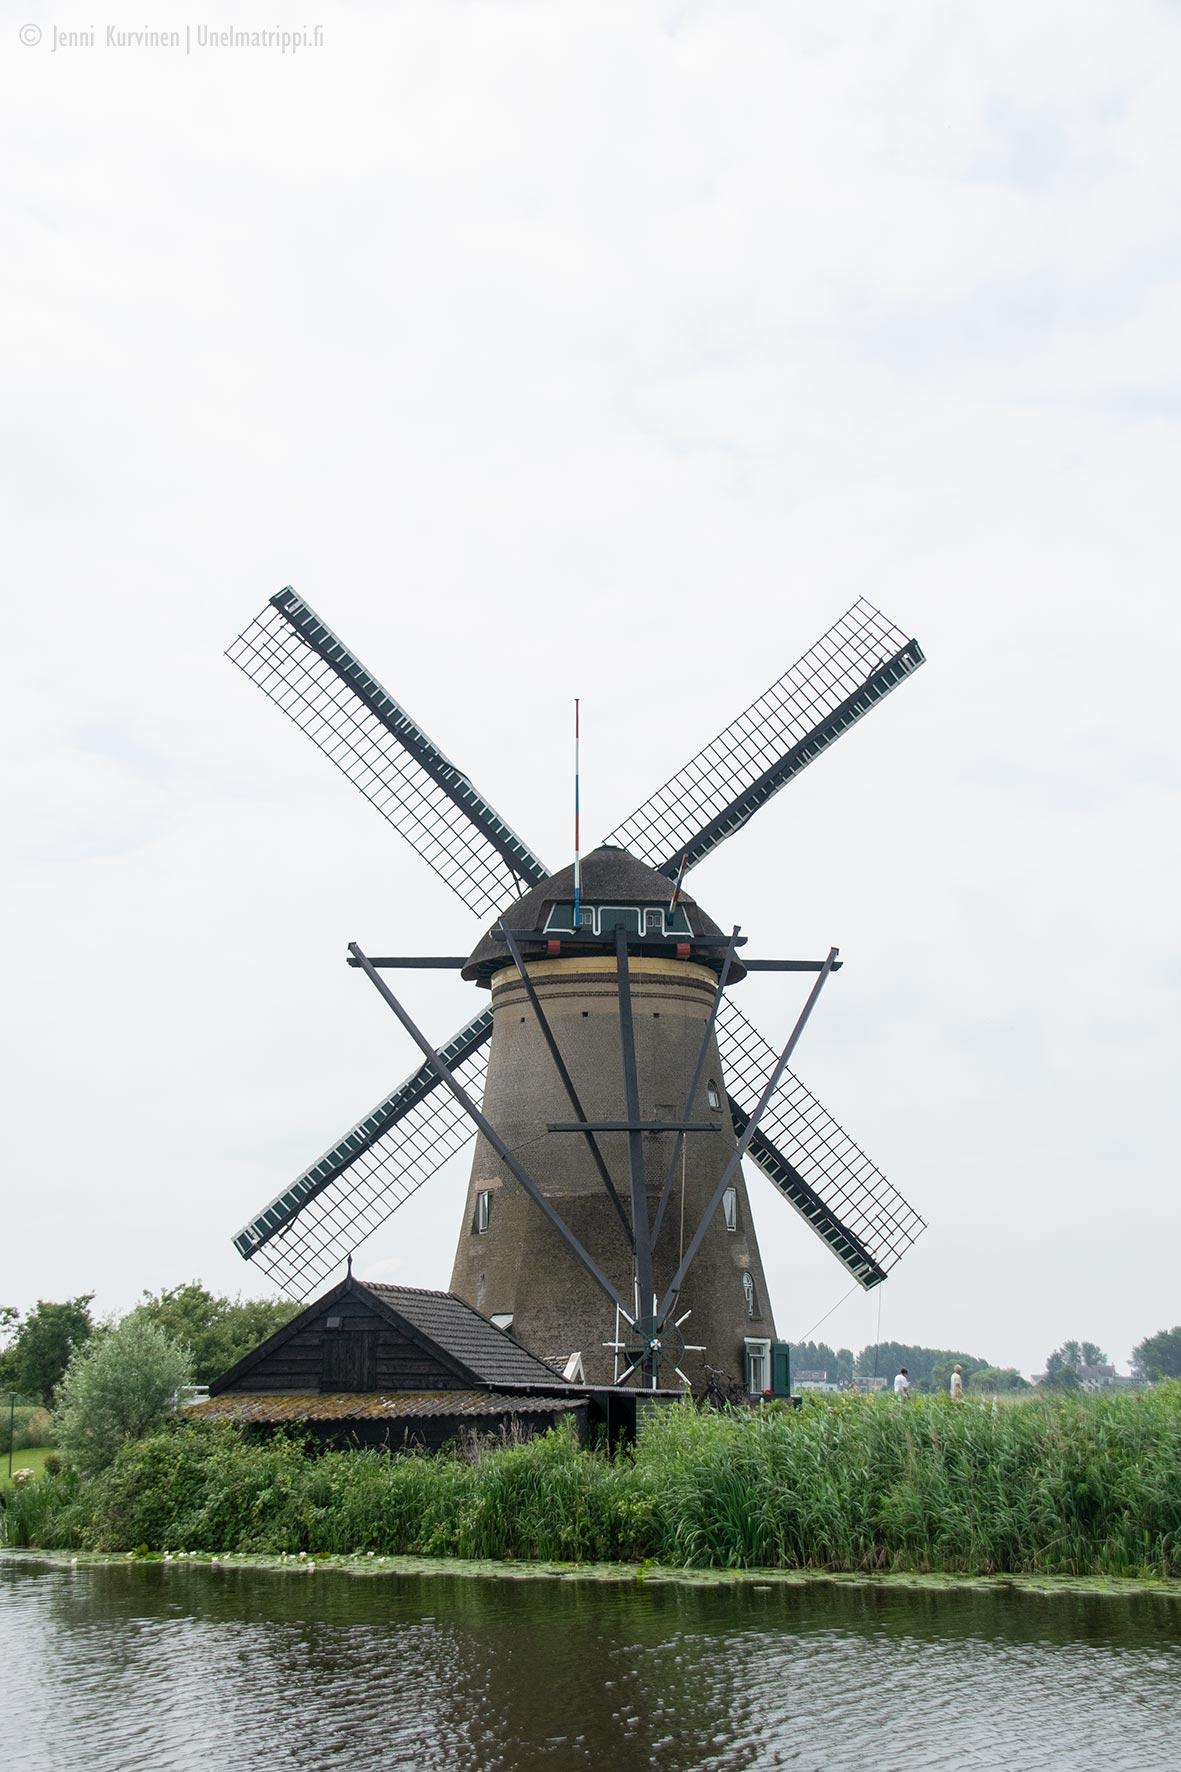 20180909-Unelmatrippi-Kinderdijk-DSC0933